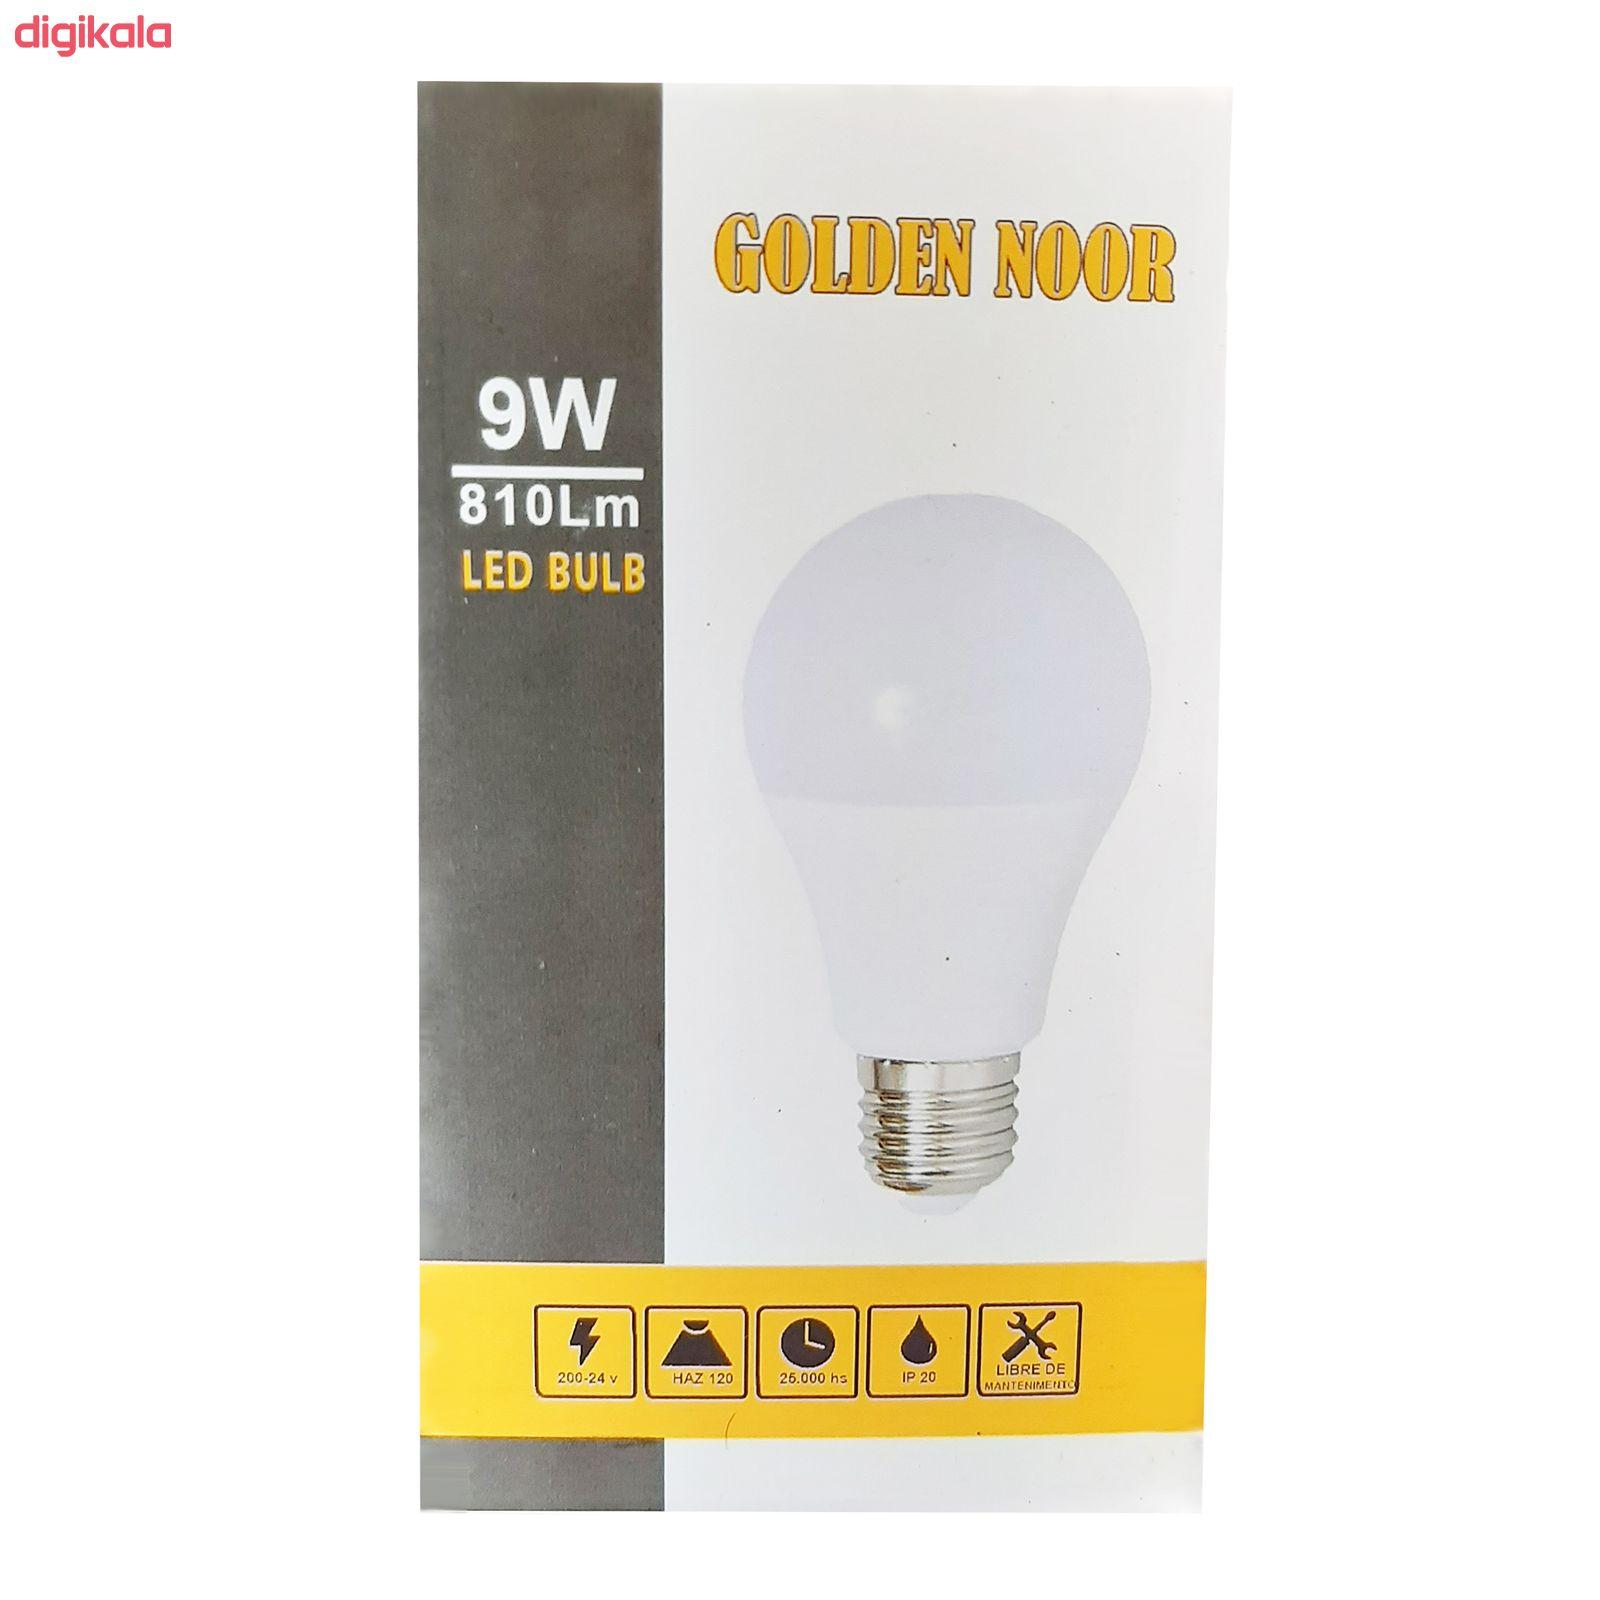 لامپ ال ای دی 9 وات گلدن نور مدل gn9 پایه E27 main 1 3